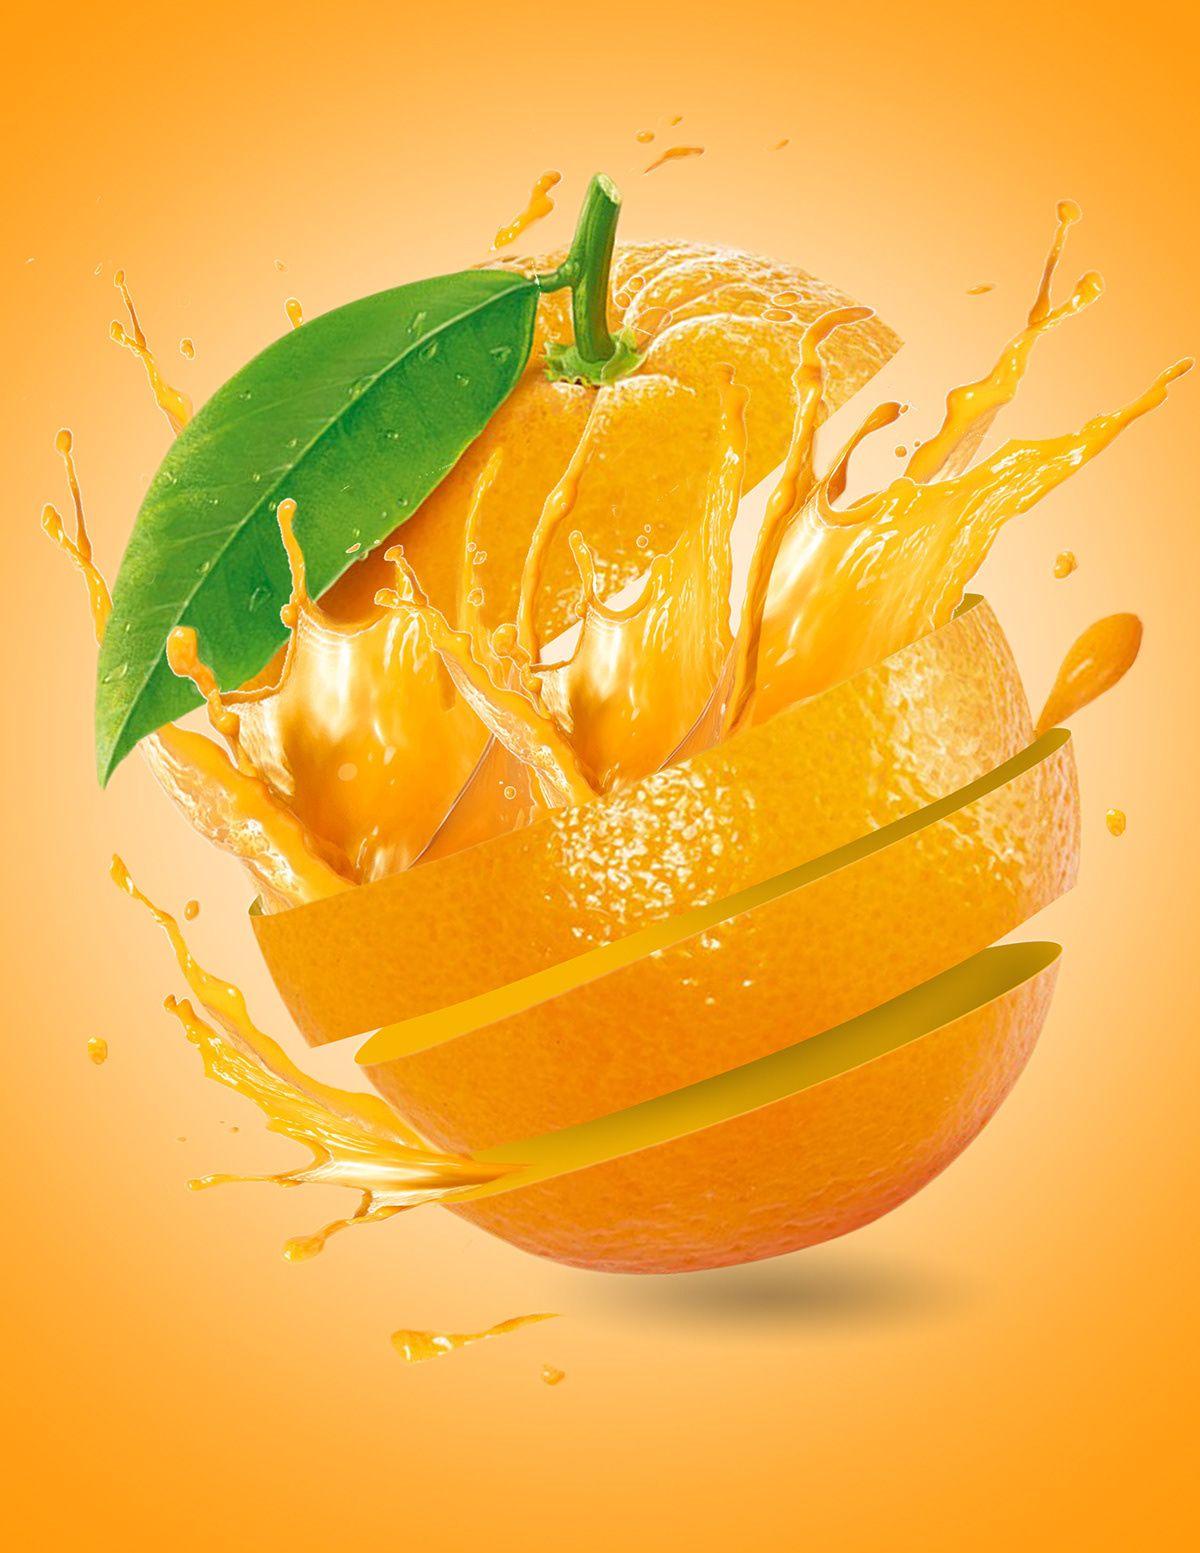 Fruit Splash On Behance Fruit Splash Fruit Logo Design Fruit Picture